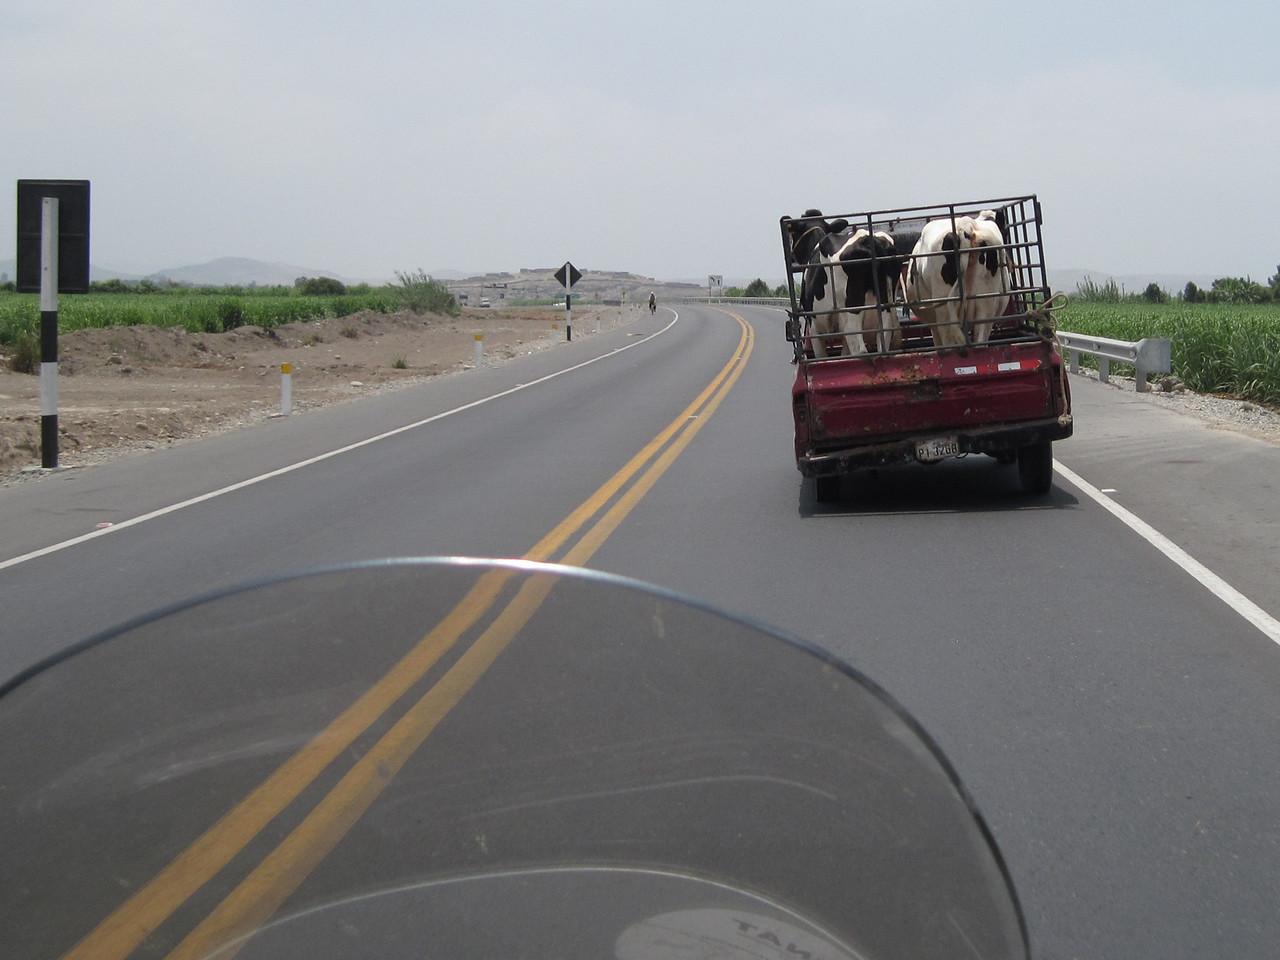 Transporting Cows - Peru